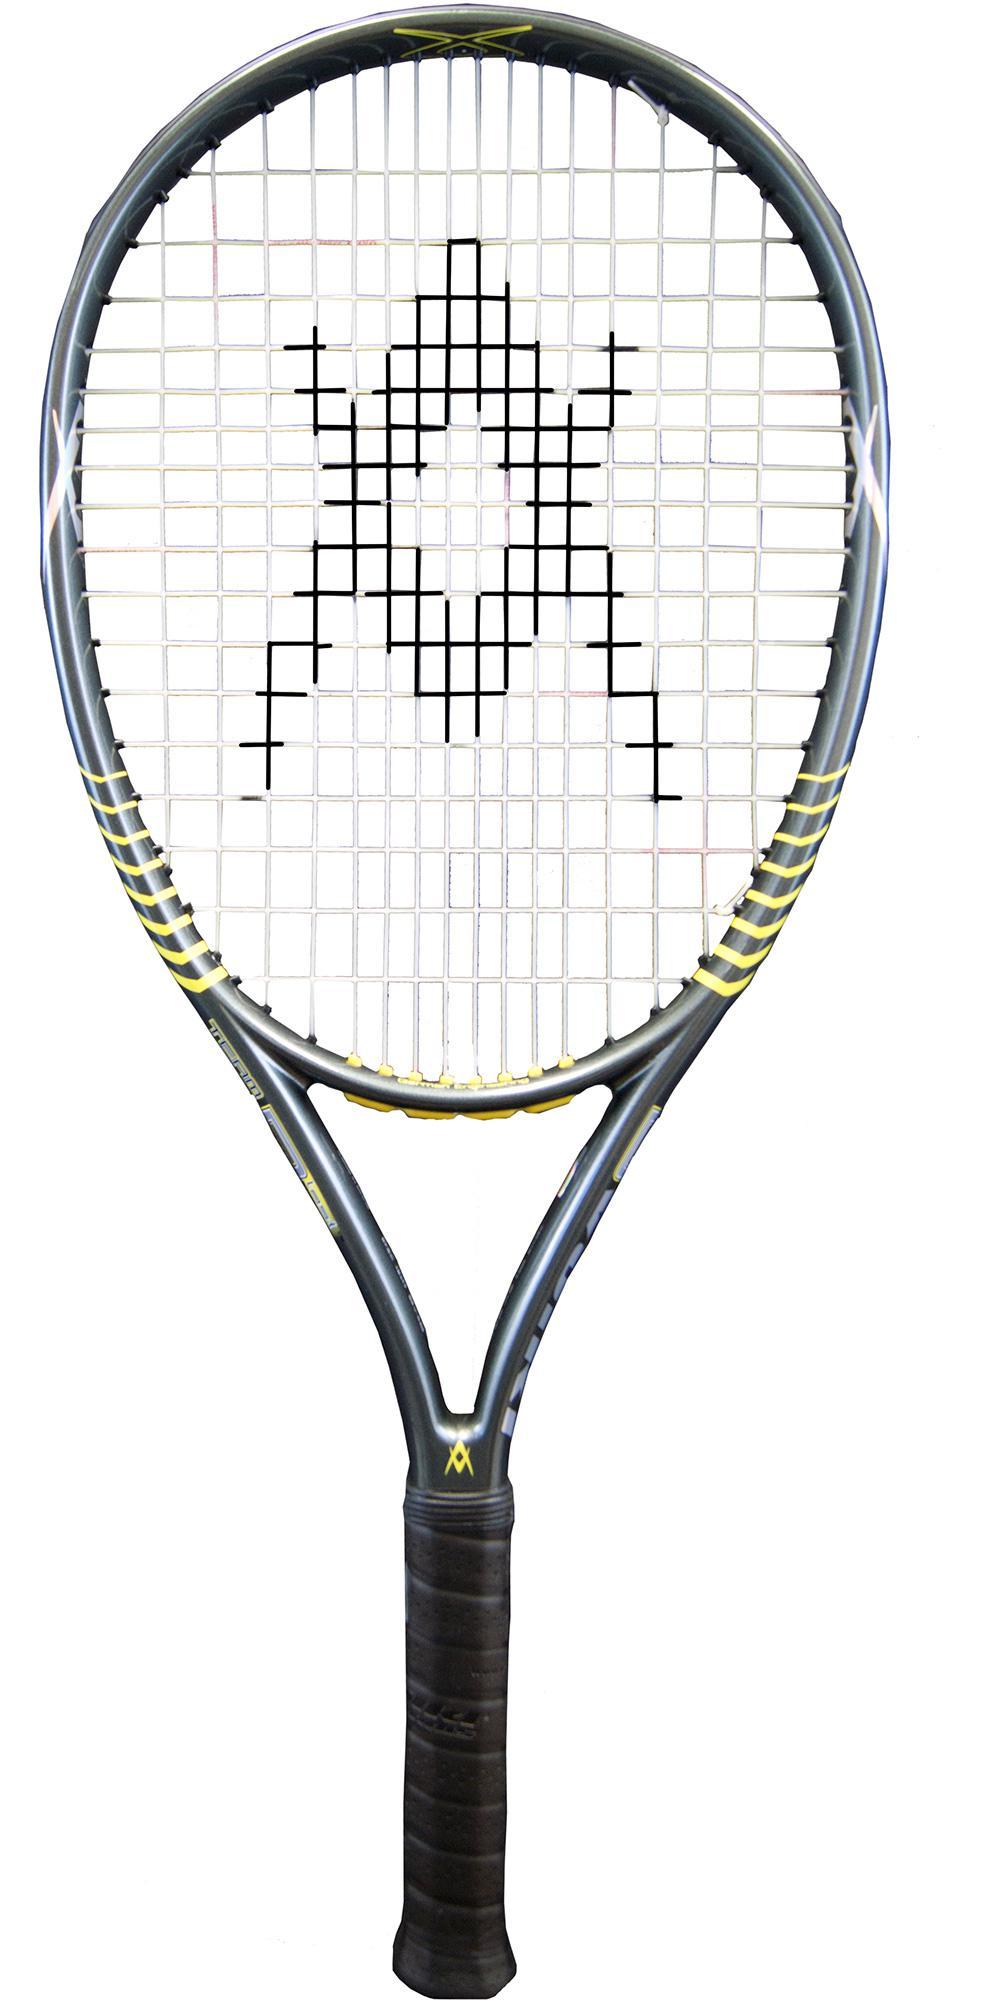 Blast Tennis Racket